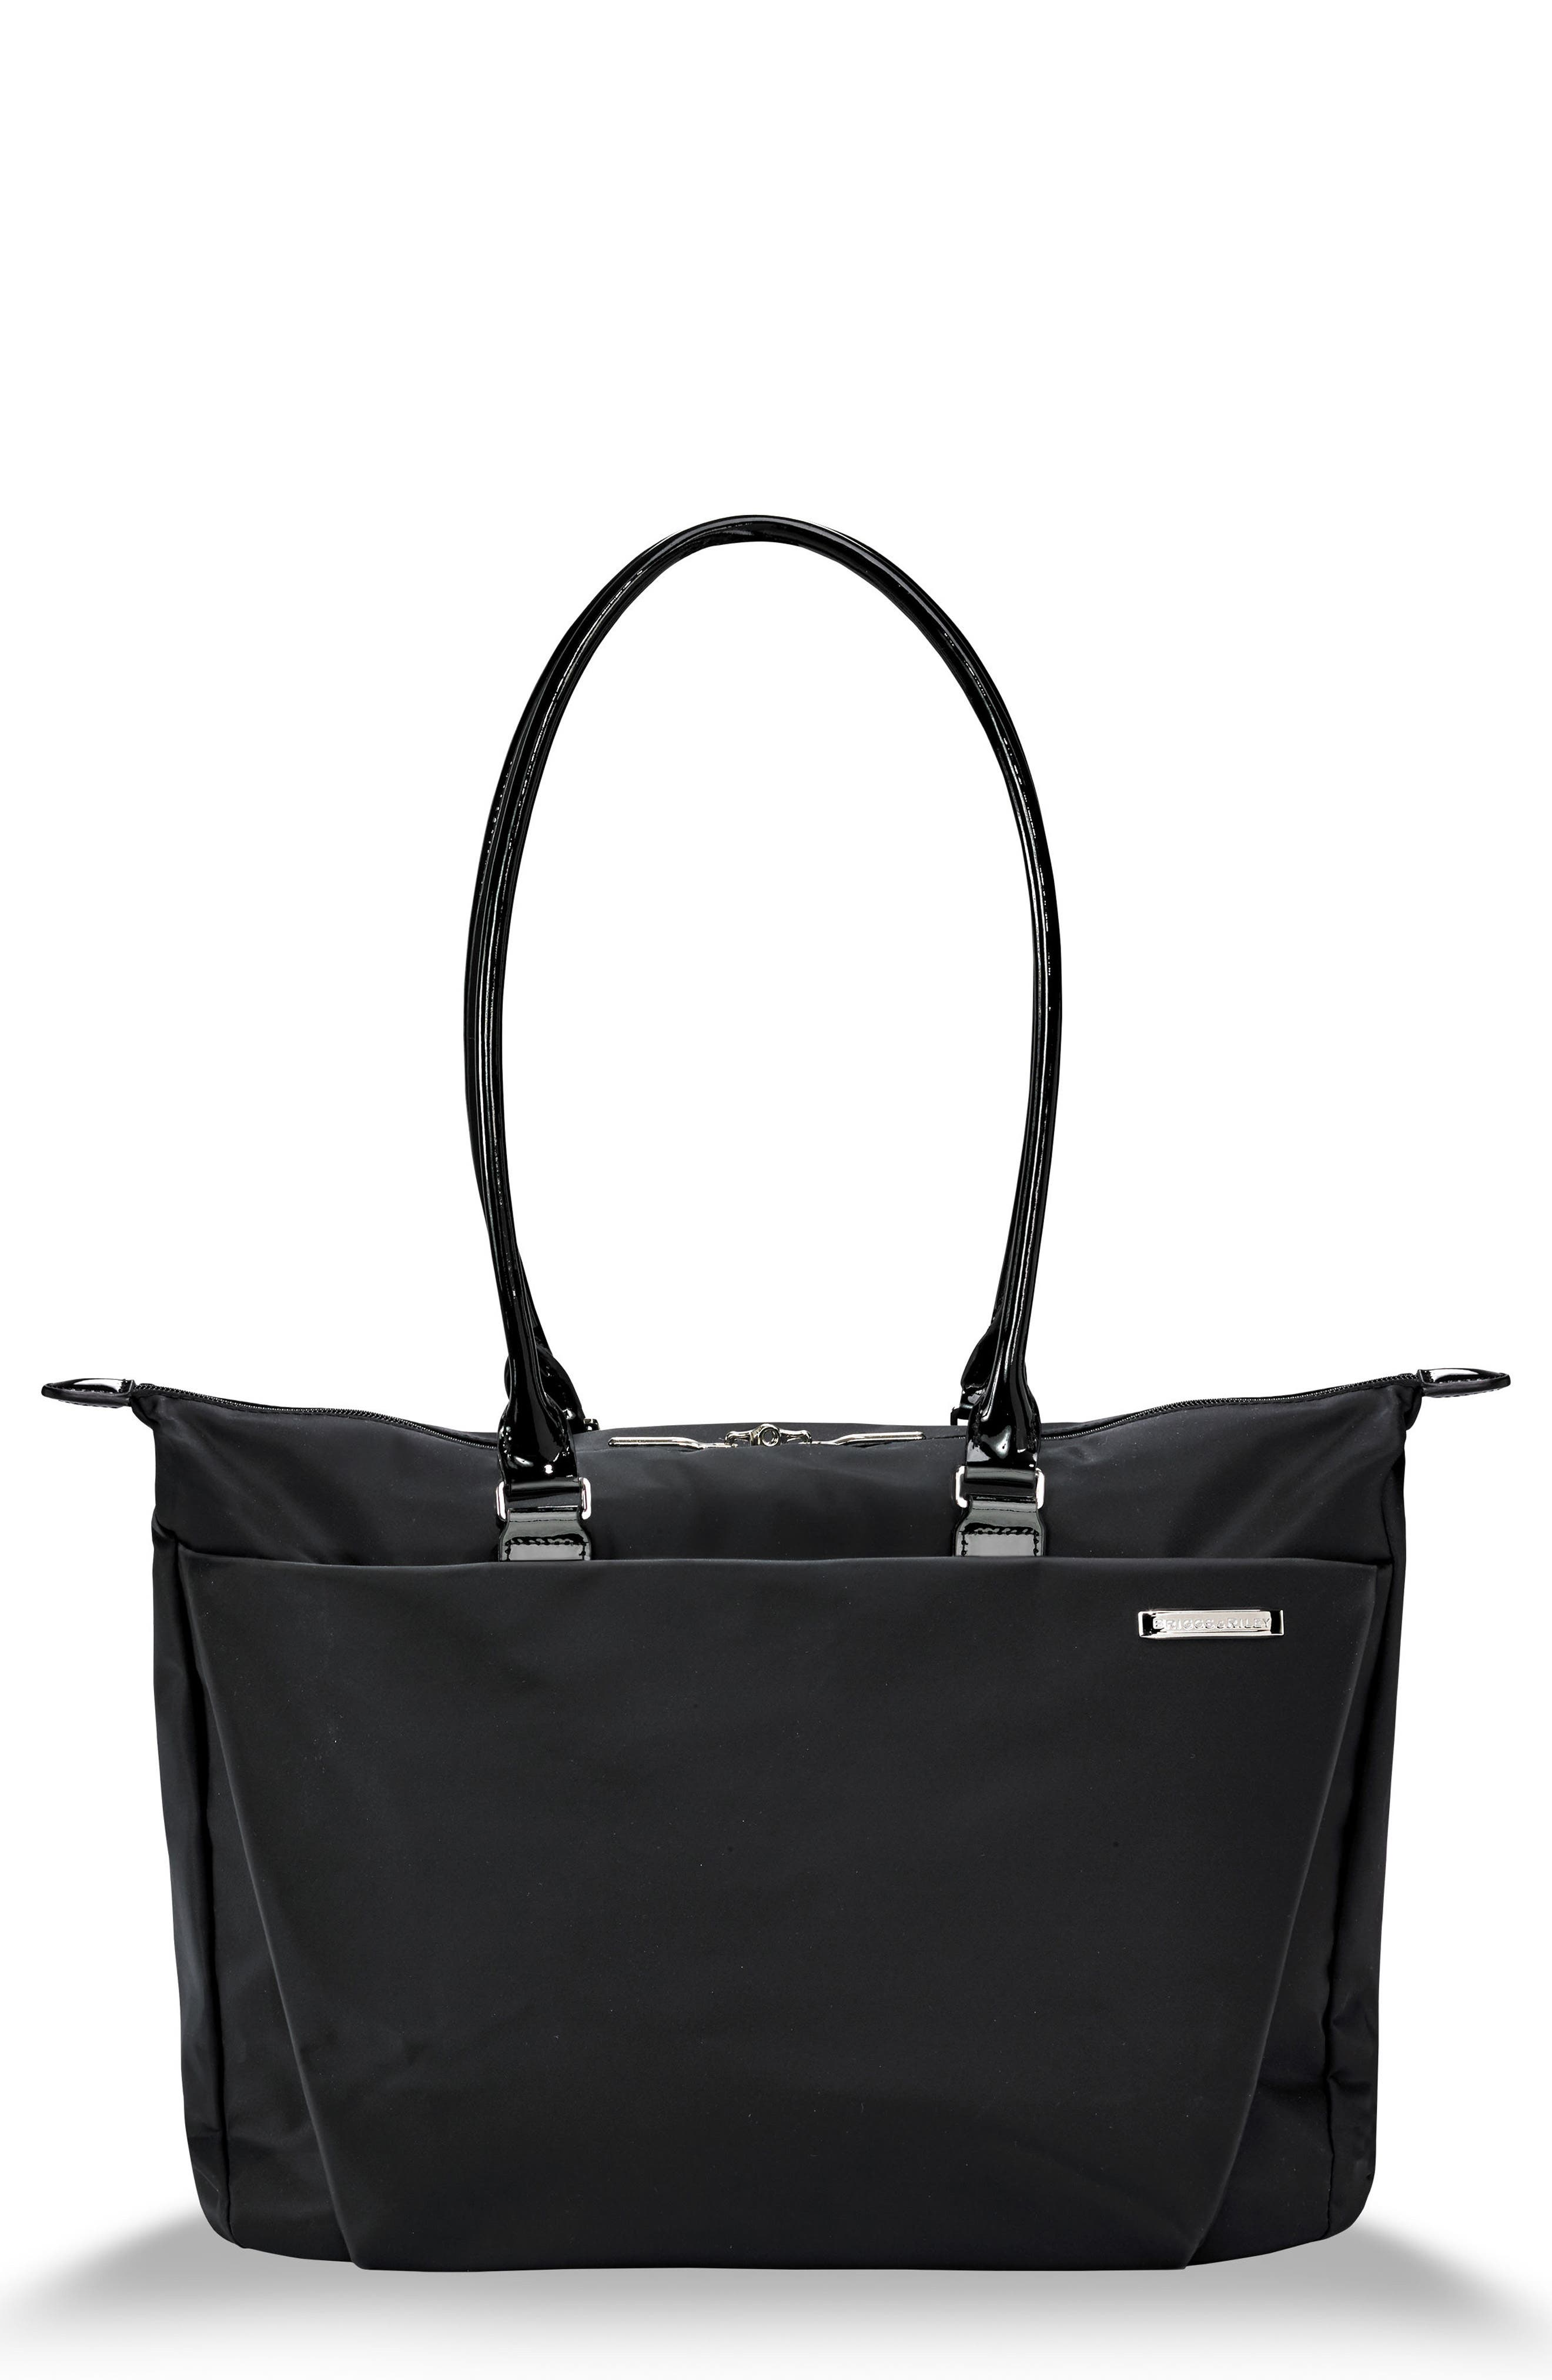 Sympatico Tote Bag,                         Main,                         color, ONYX